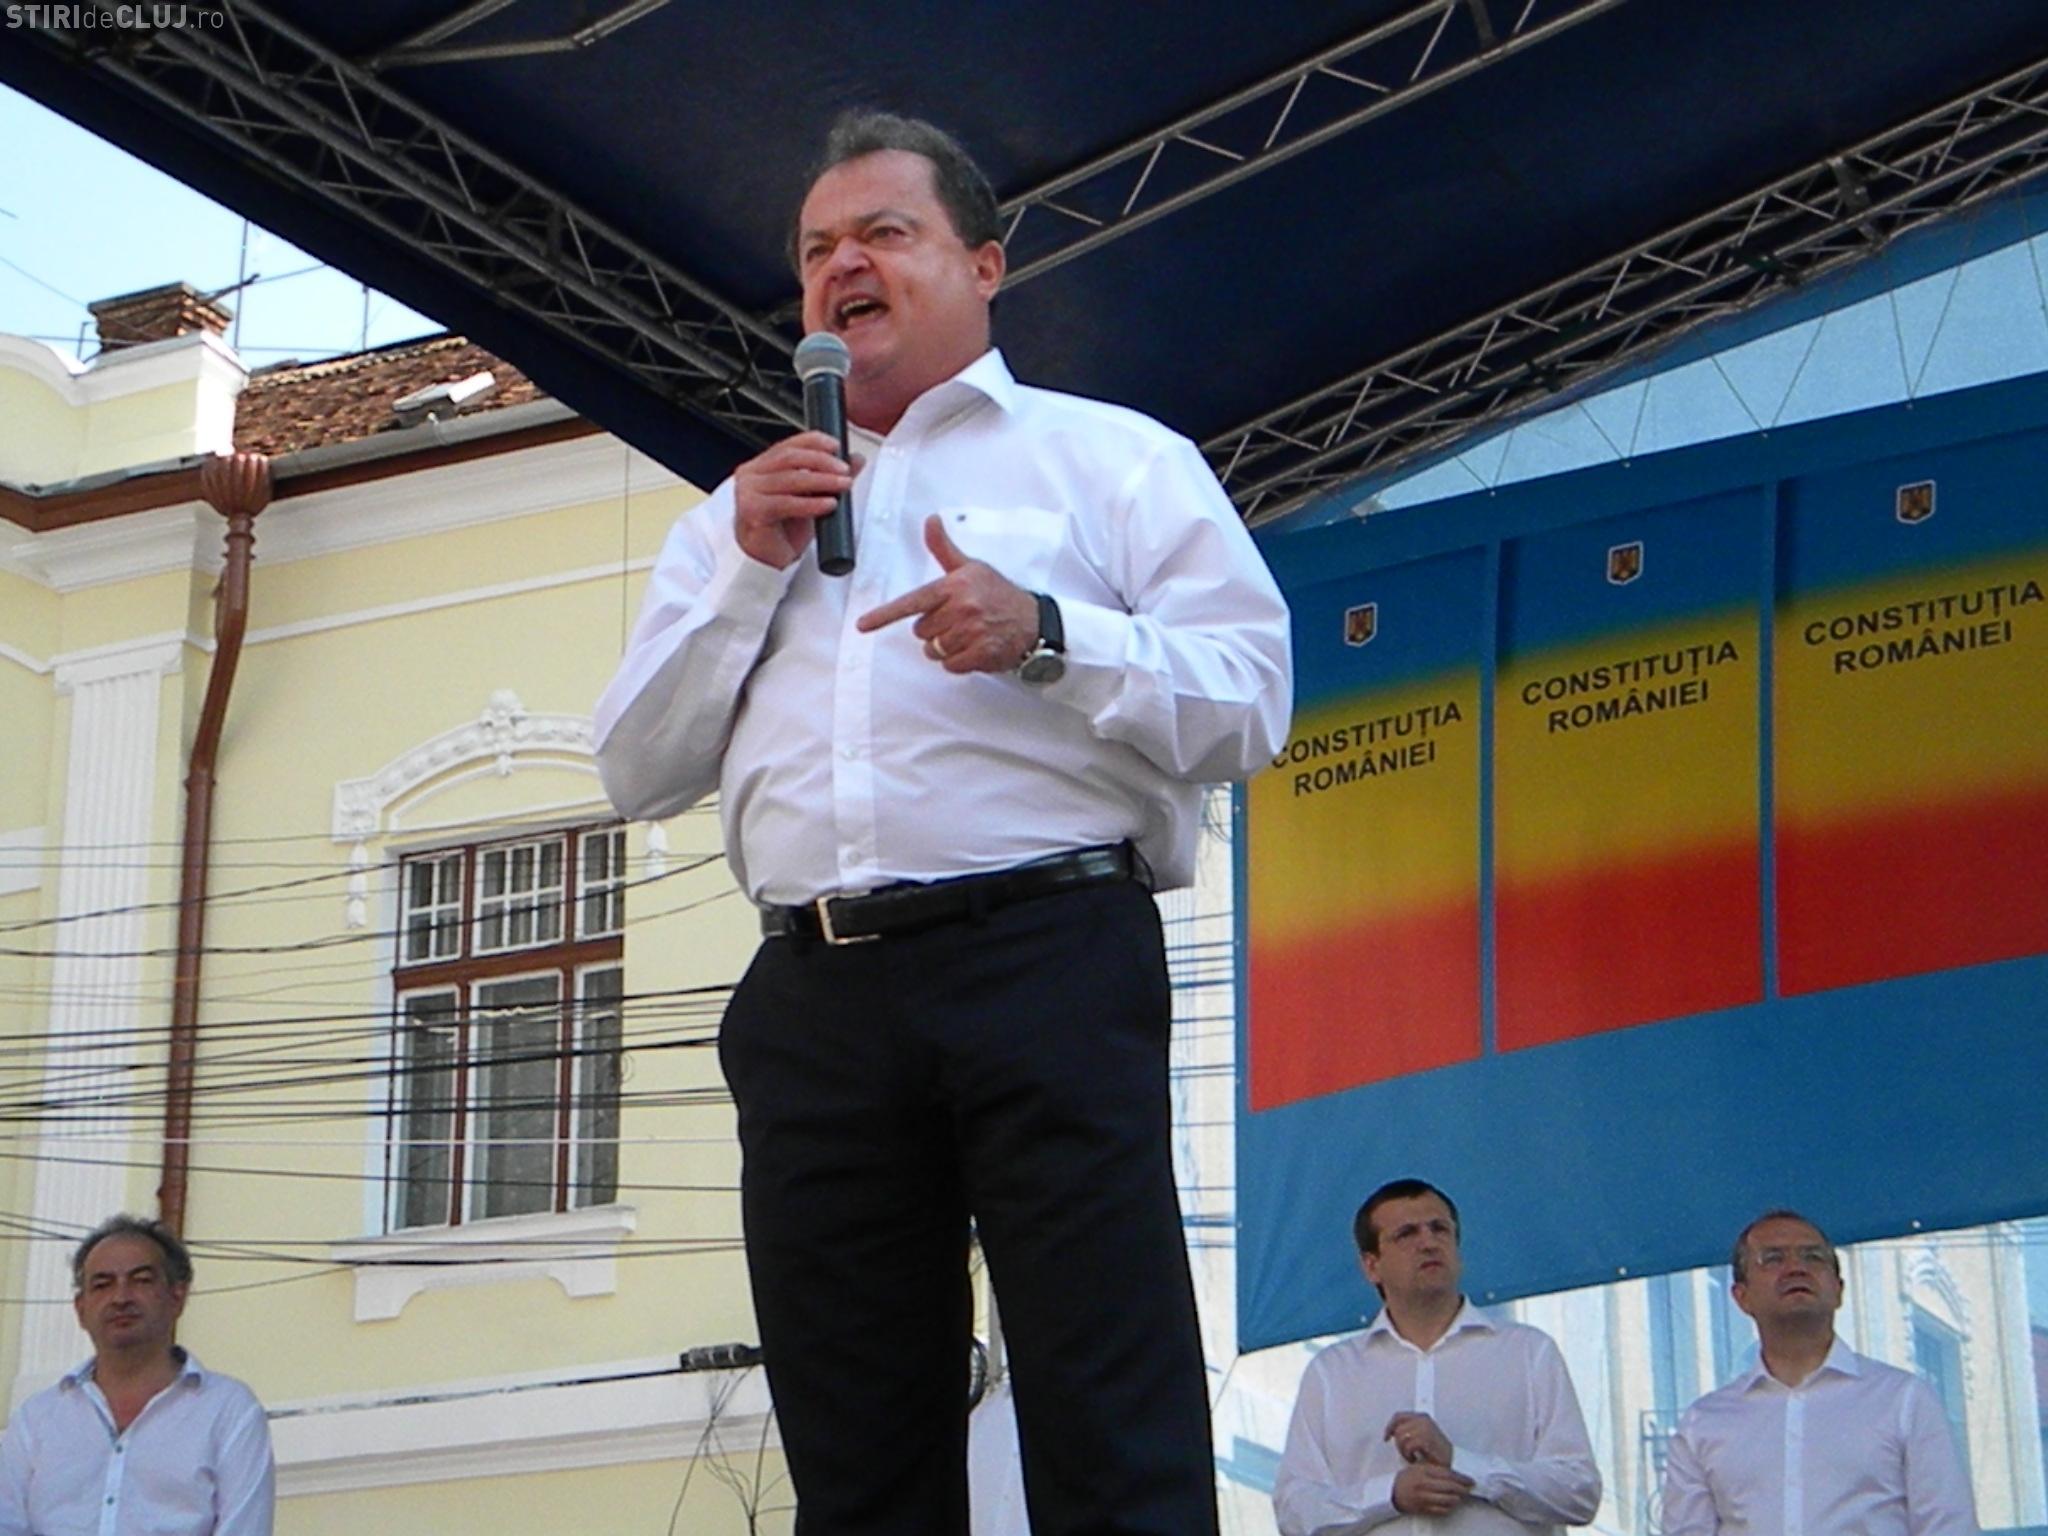 ALEGERI PDL: Blaga este noul președinte al PDL